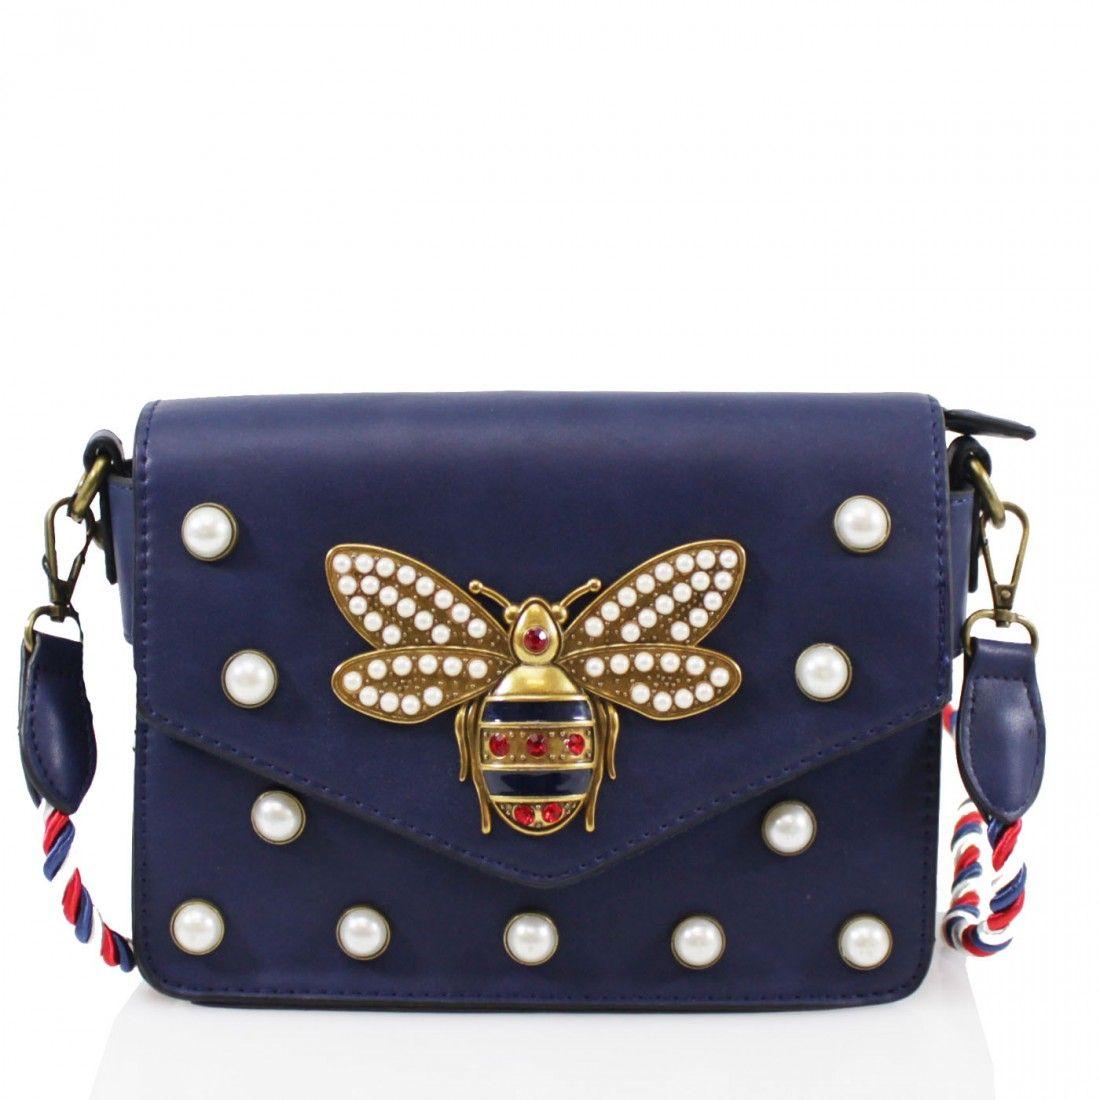 6c17b8871a Gucci, gucci bag, gucci inspired, gucci inspired bag, gucci dupe, gucci bag  dupe, designer, designer inspired, designer dupe, designer bag dupe, ...